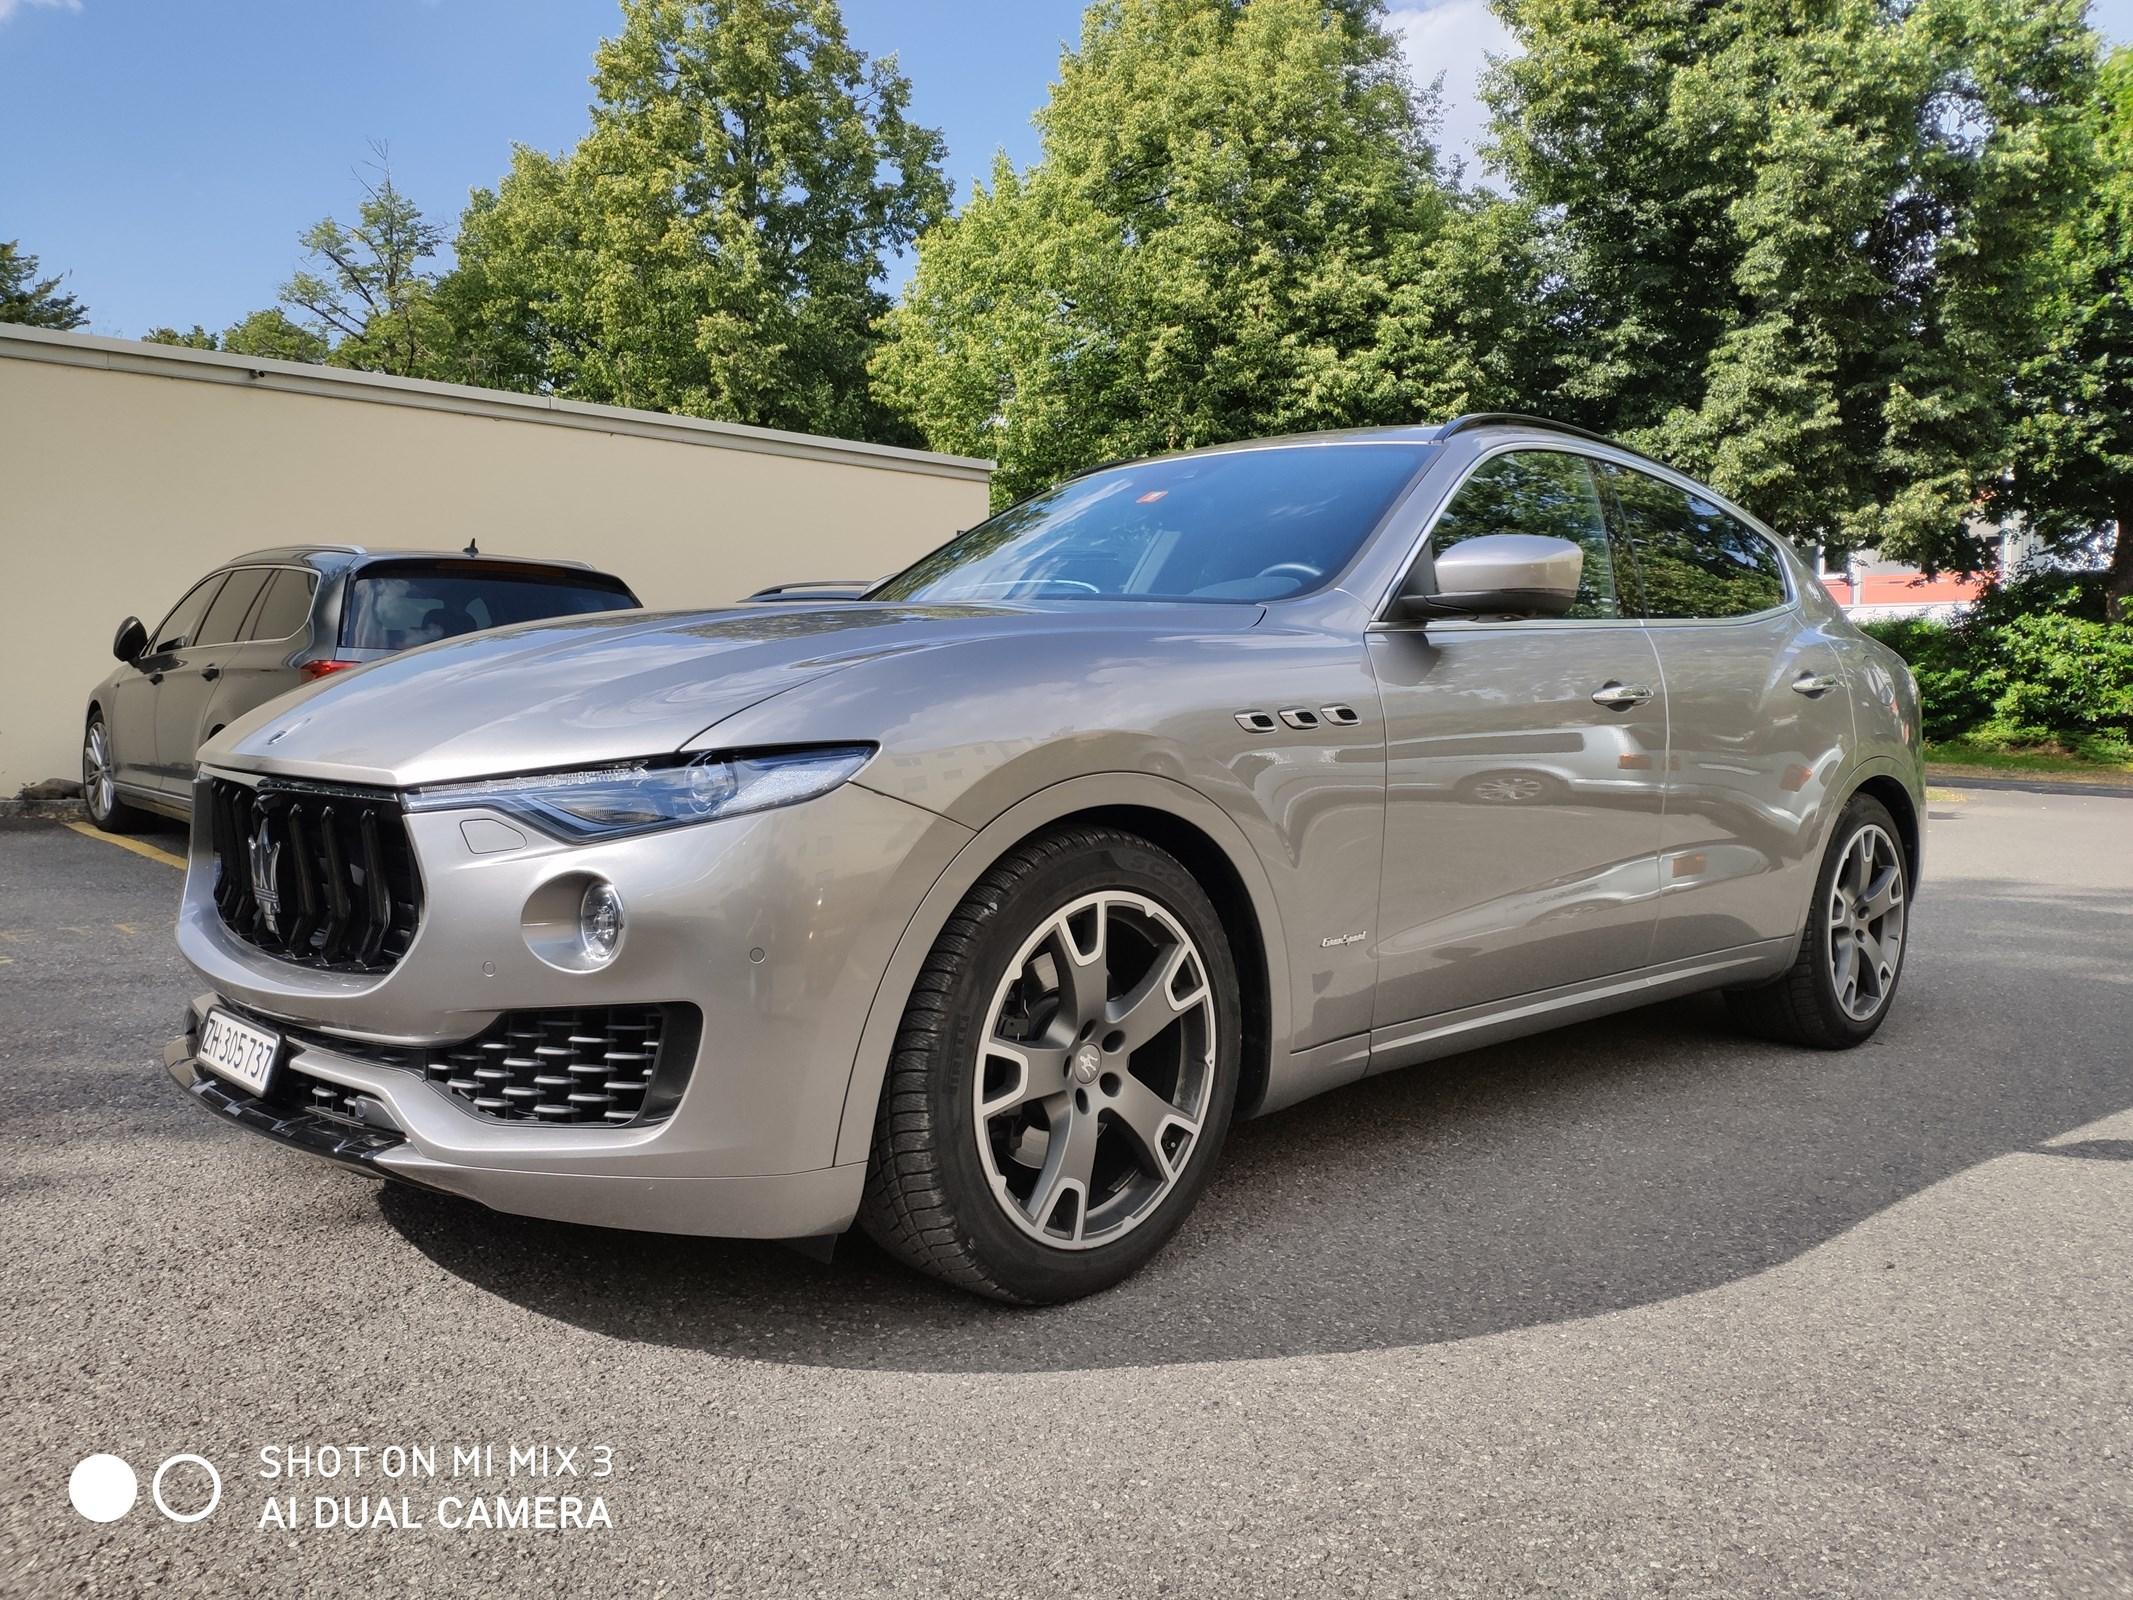 Maserati Levante 3.0 V6 D